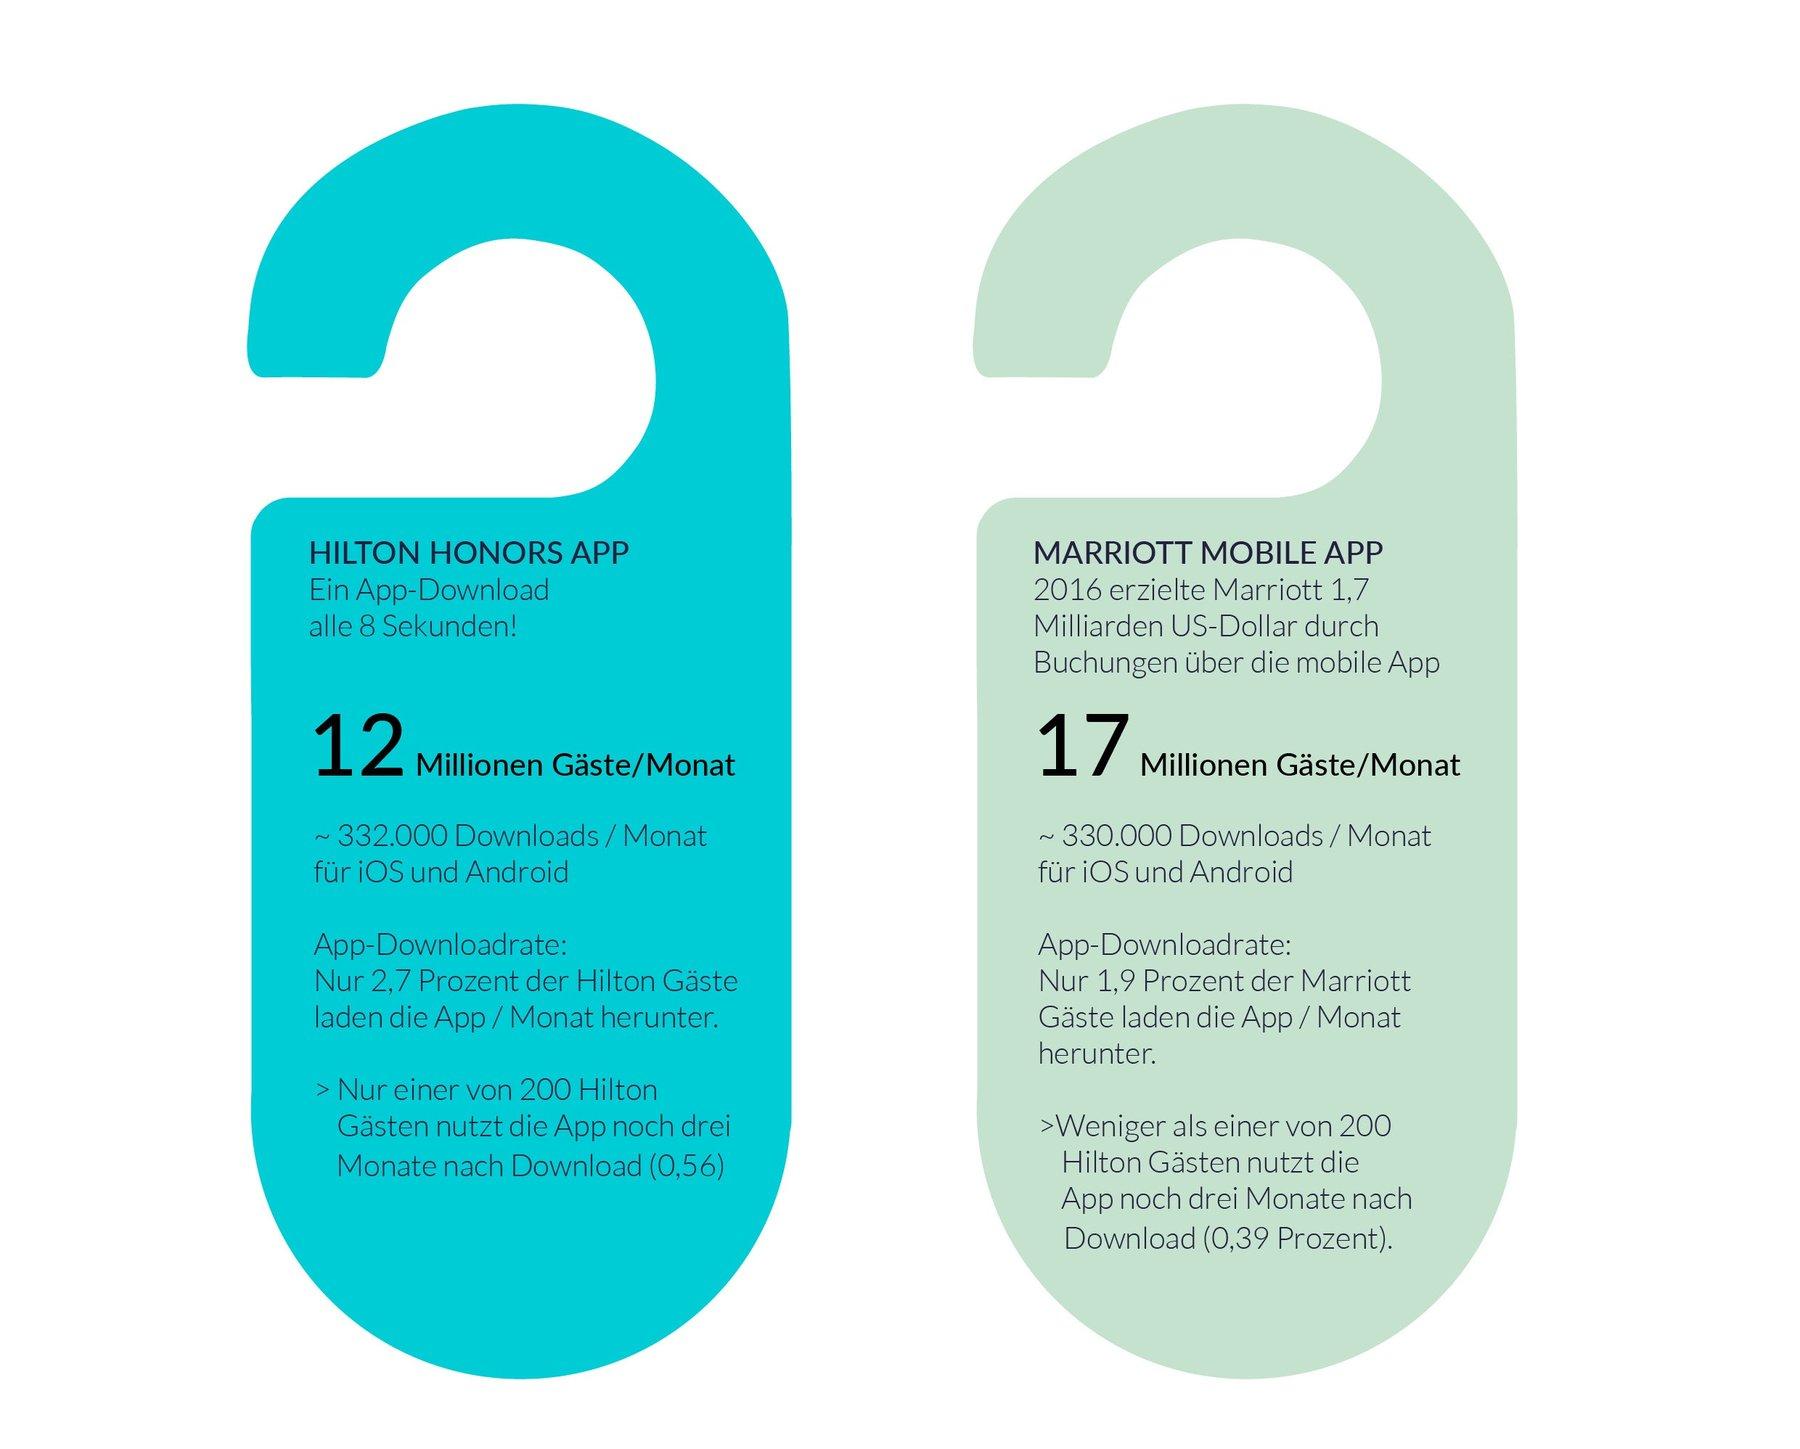 Die zwei erfolgreichsten Hotel-Apps: Hilton Honors App & Marriott Mobile App